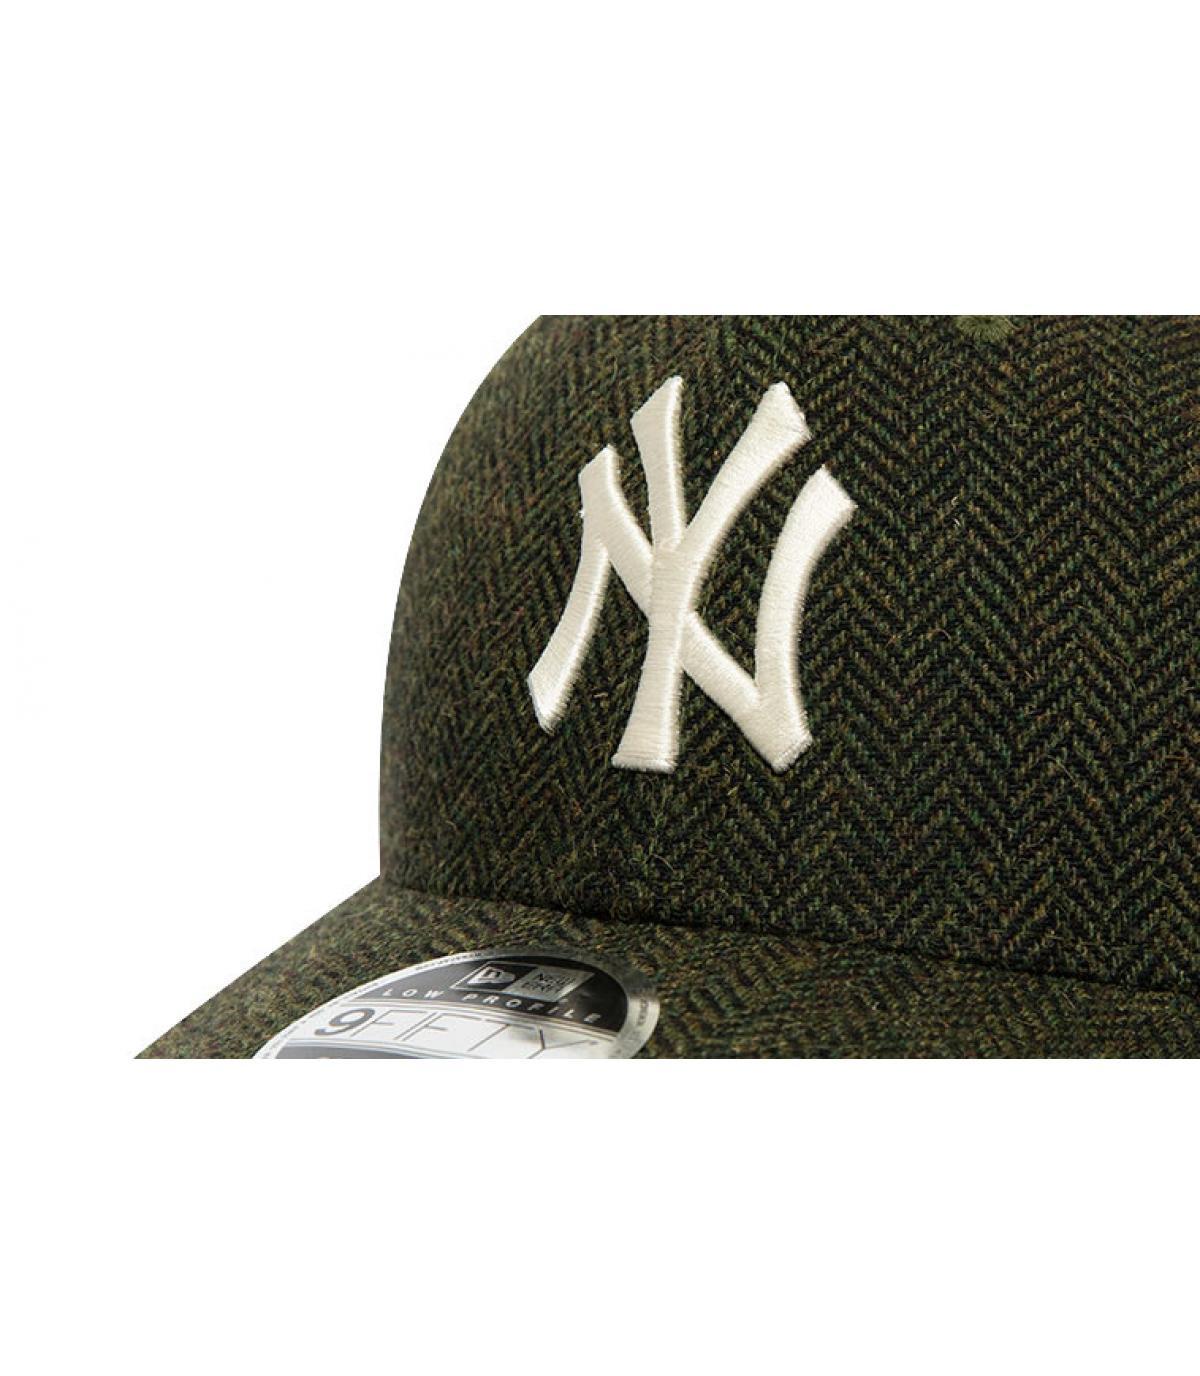 Details Snapback MLB Tweed NY 950 army green - Abbildung 3